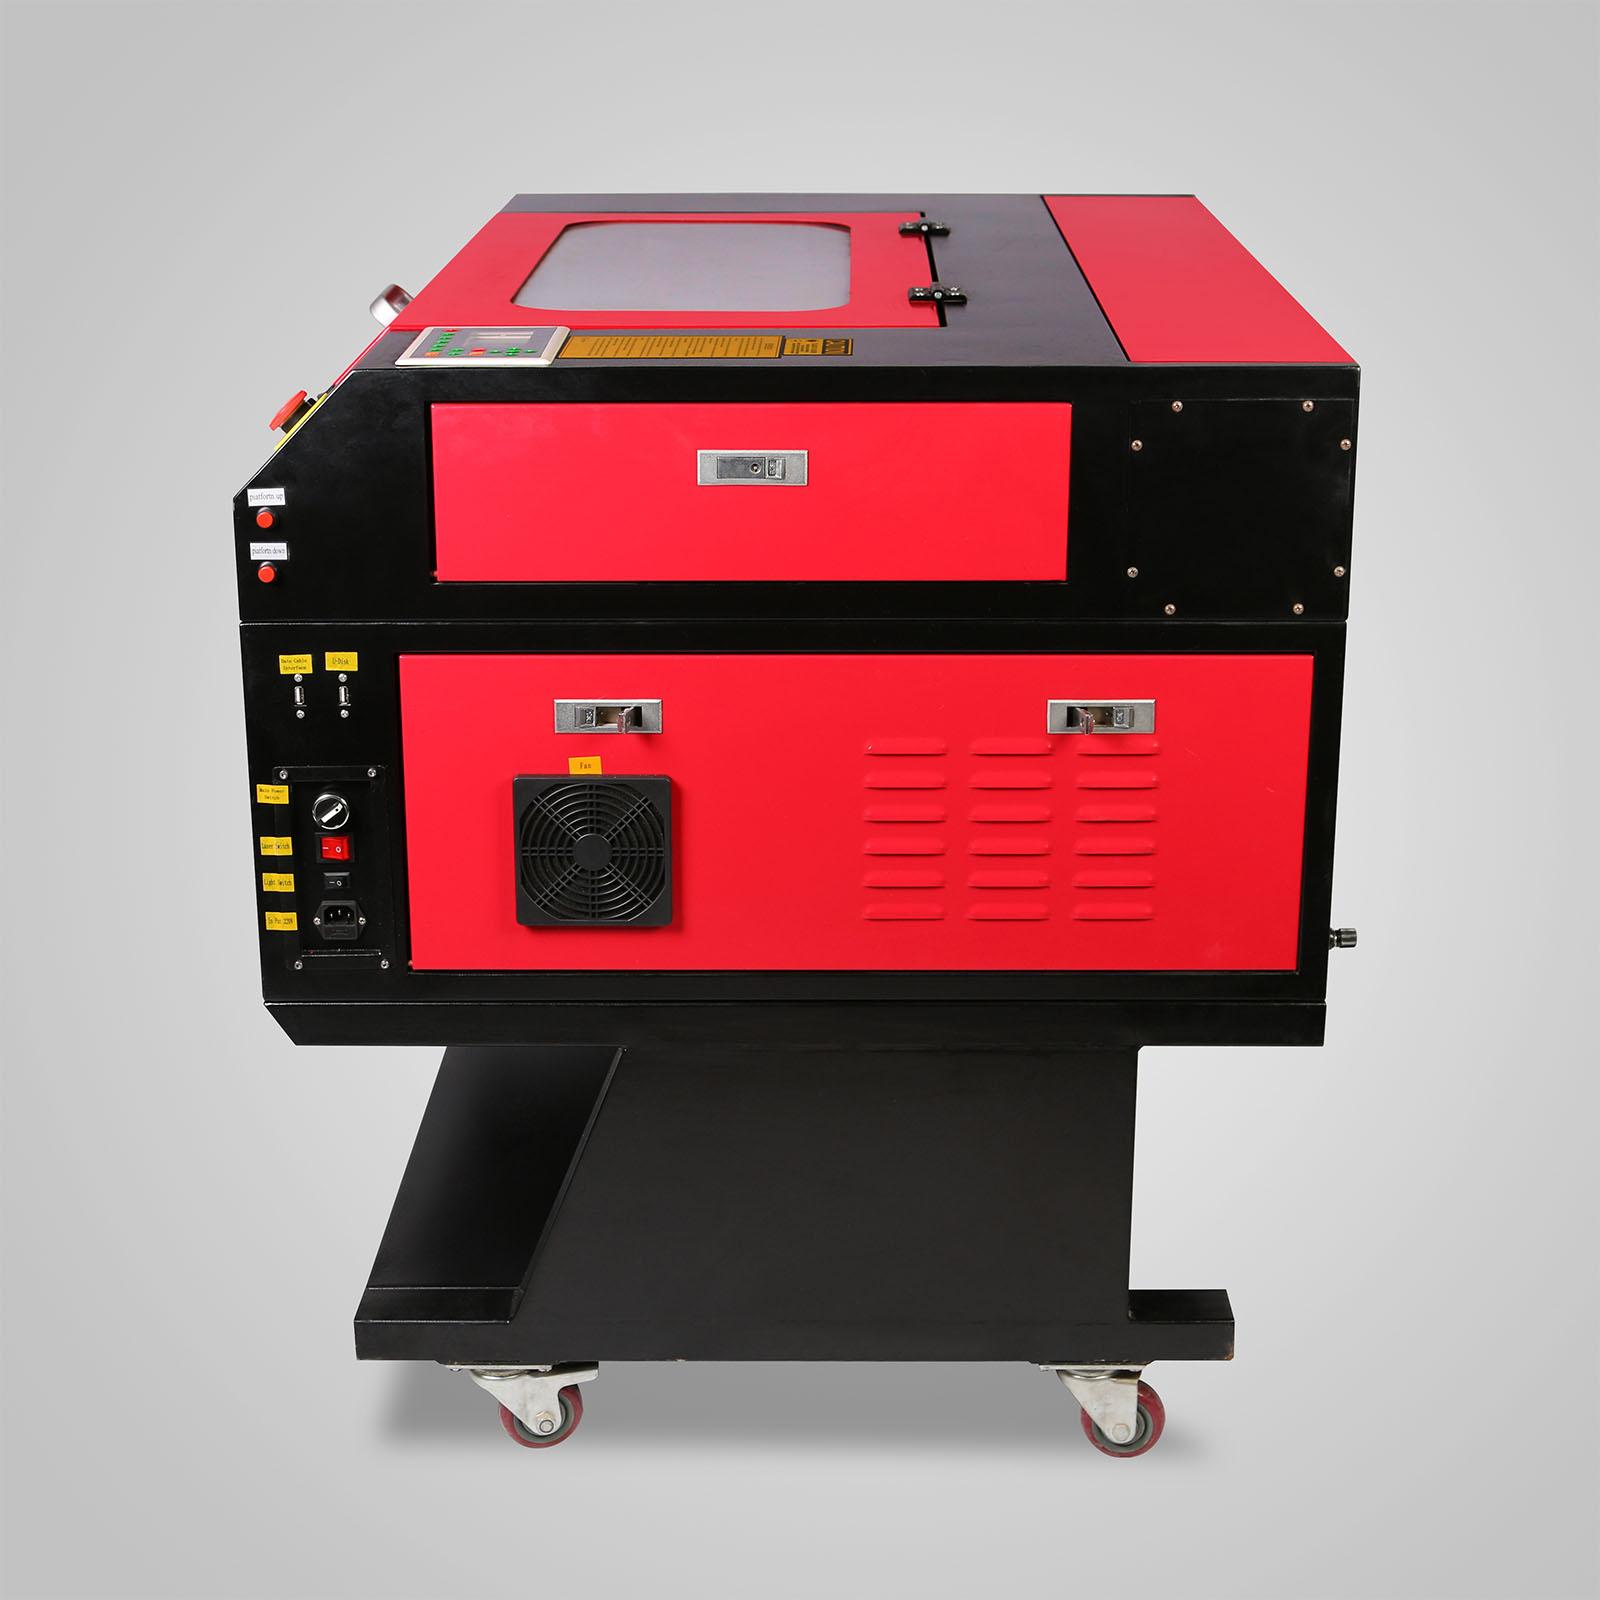 Macchina-per-Incisione-Laser-CO2-40-130W-Asse-Rotante-Tagliatrice-Incisore miniatura 41